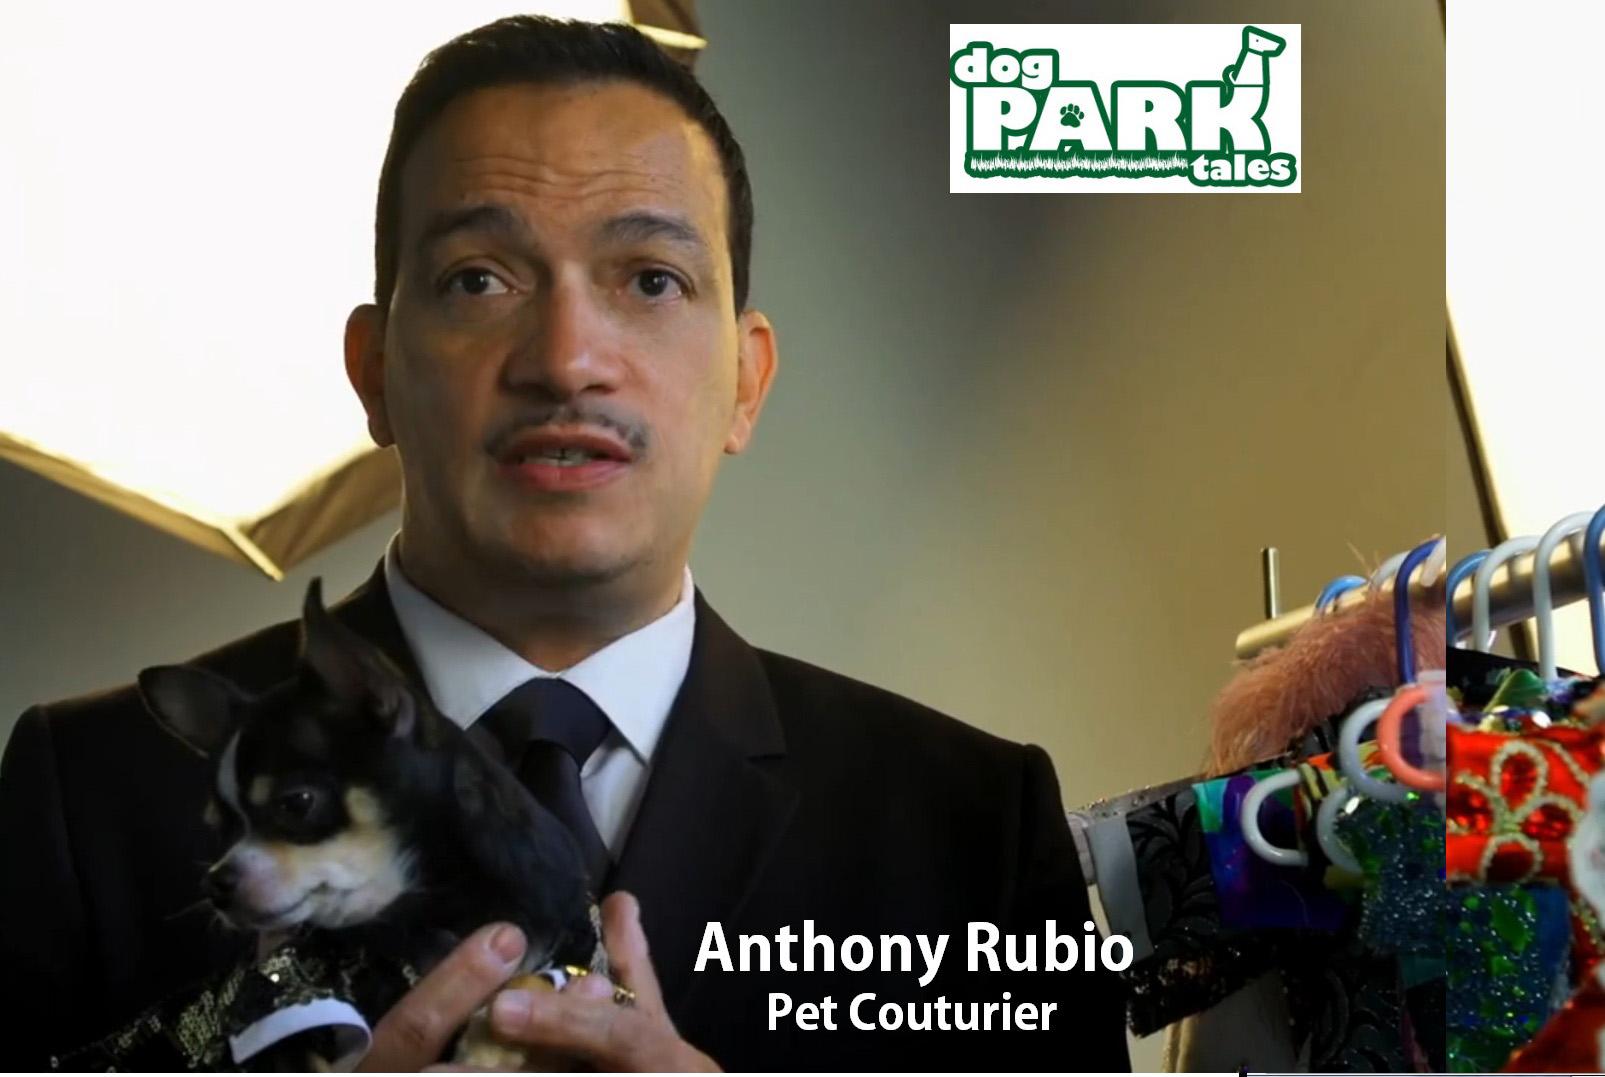 Anthony Rubio hosts Dog Park Tales TV Show